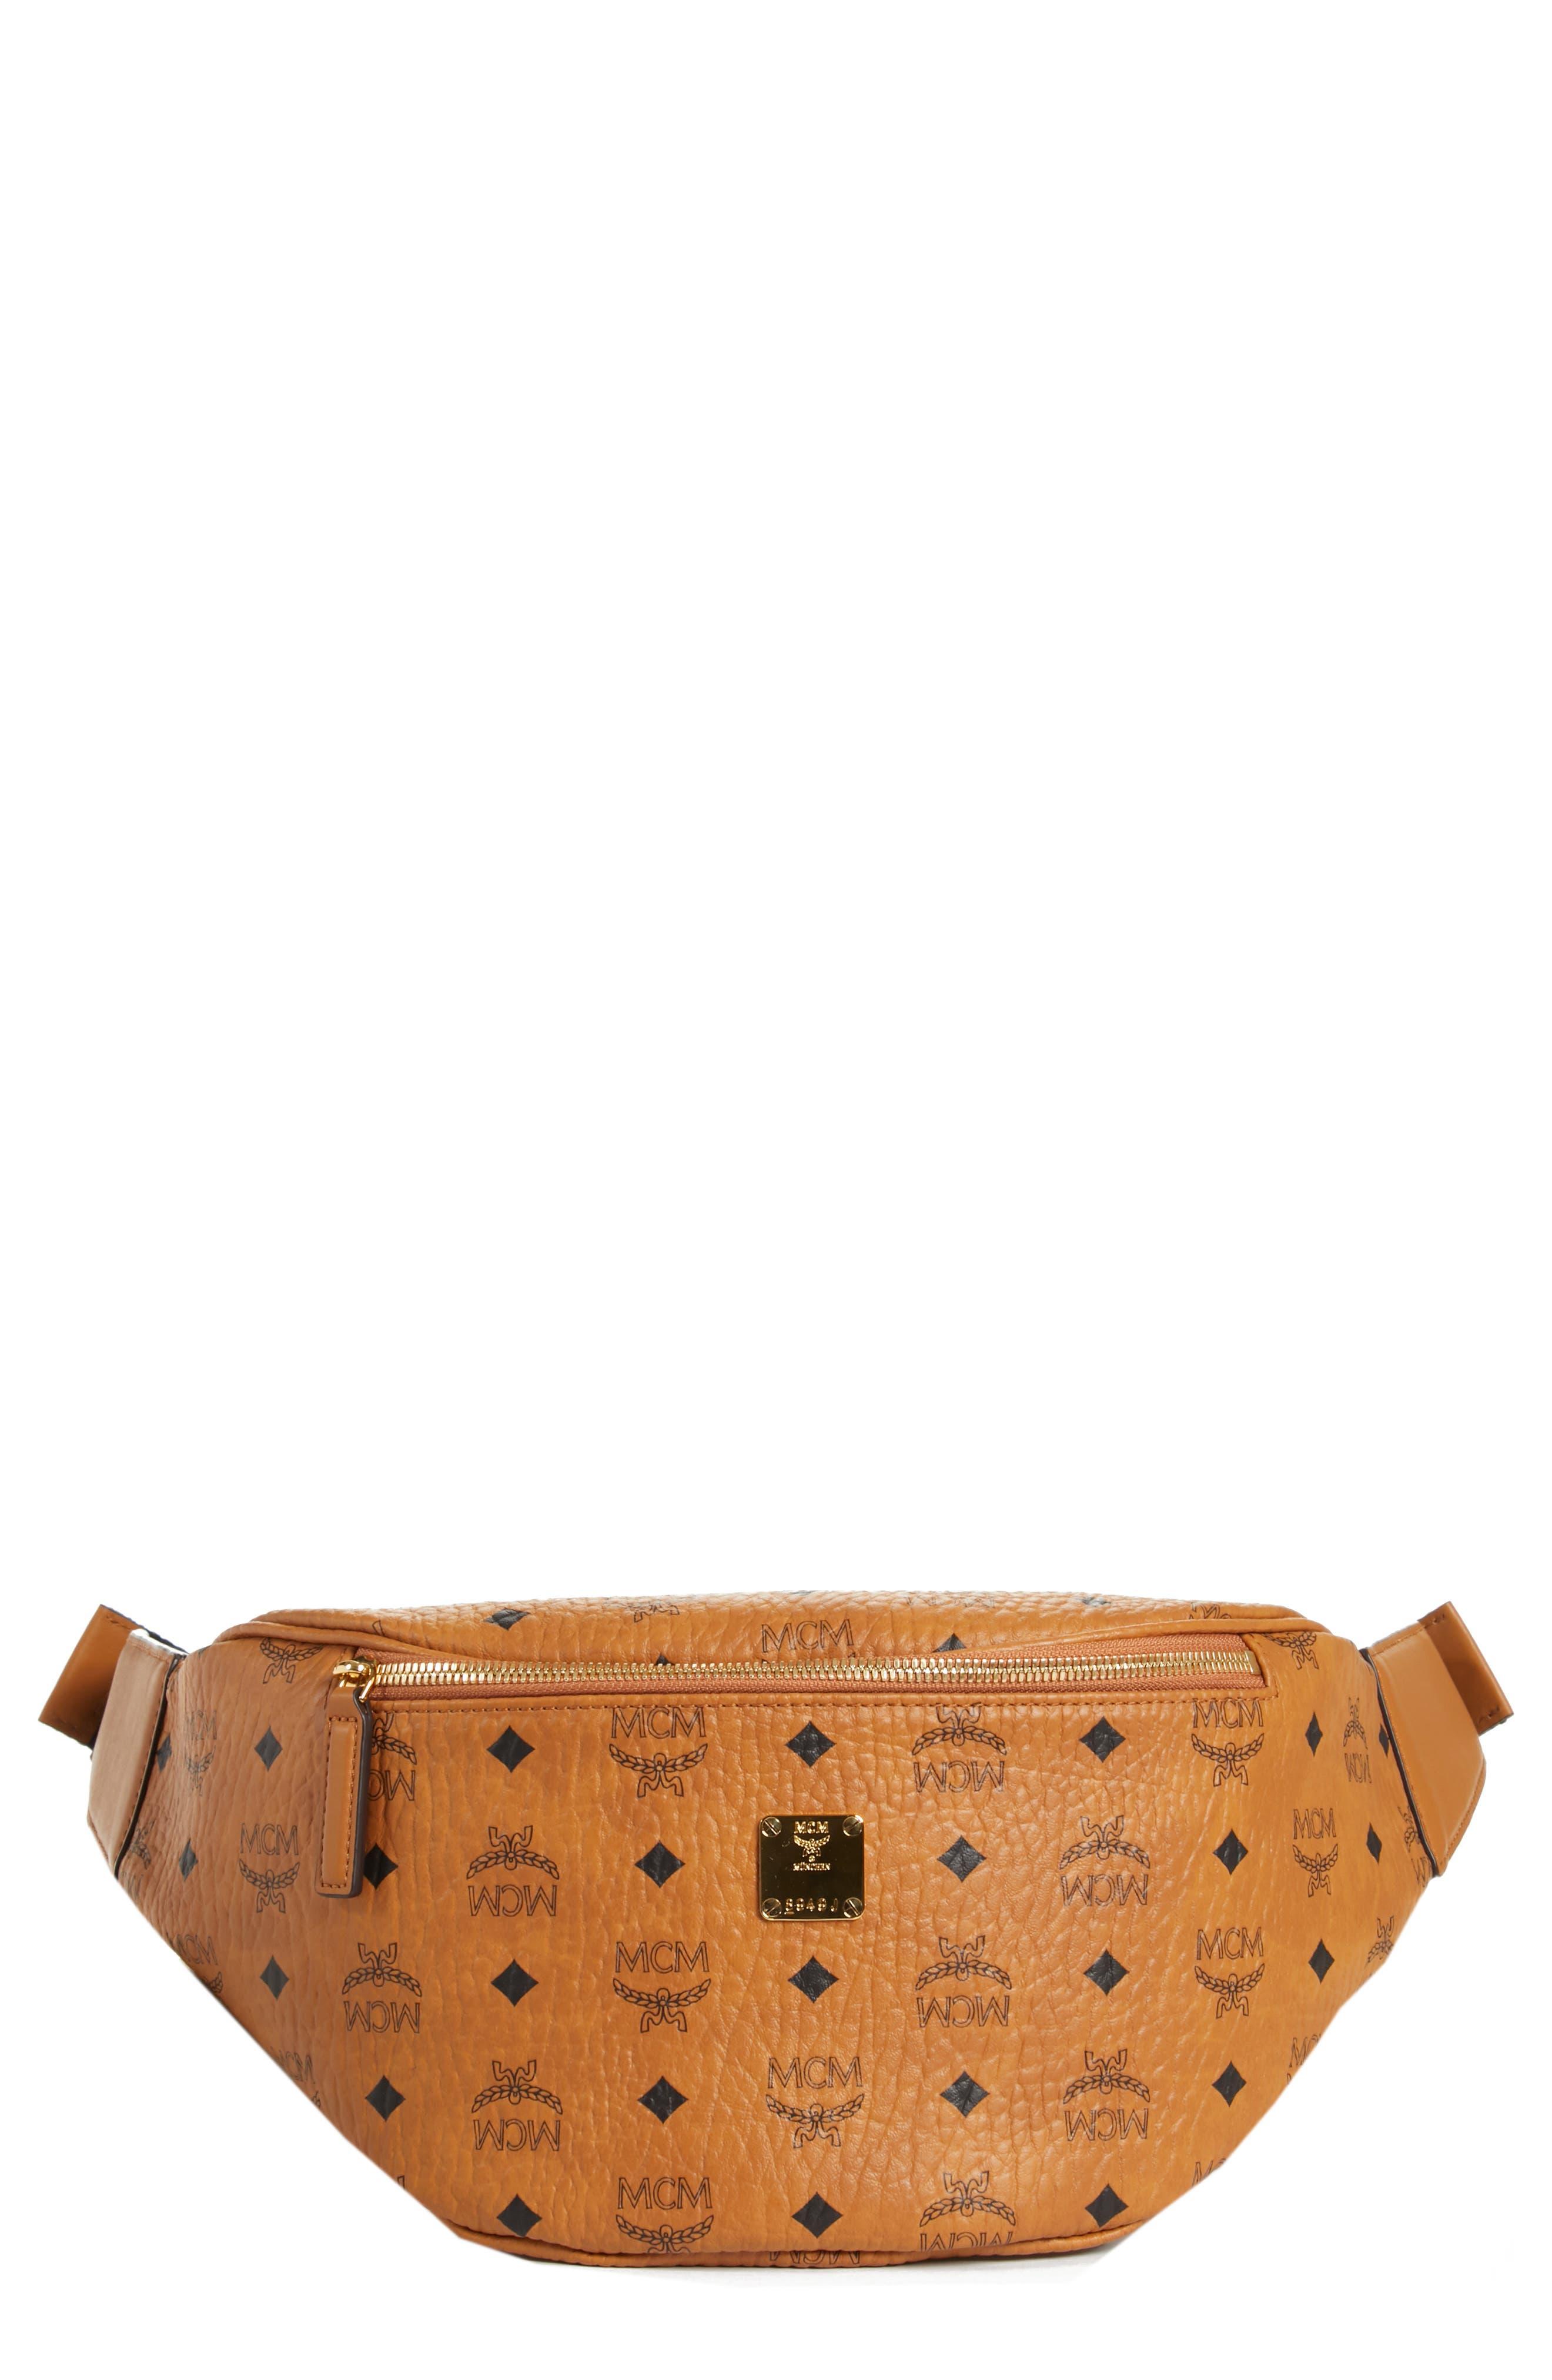 Medium Stark Belt Bag,                         Main,                         color, COGNAC CO